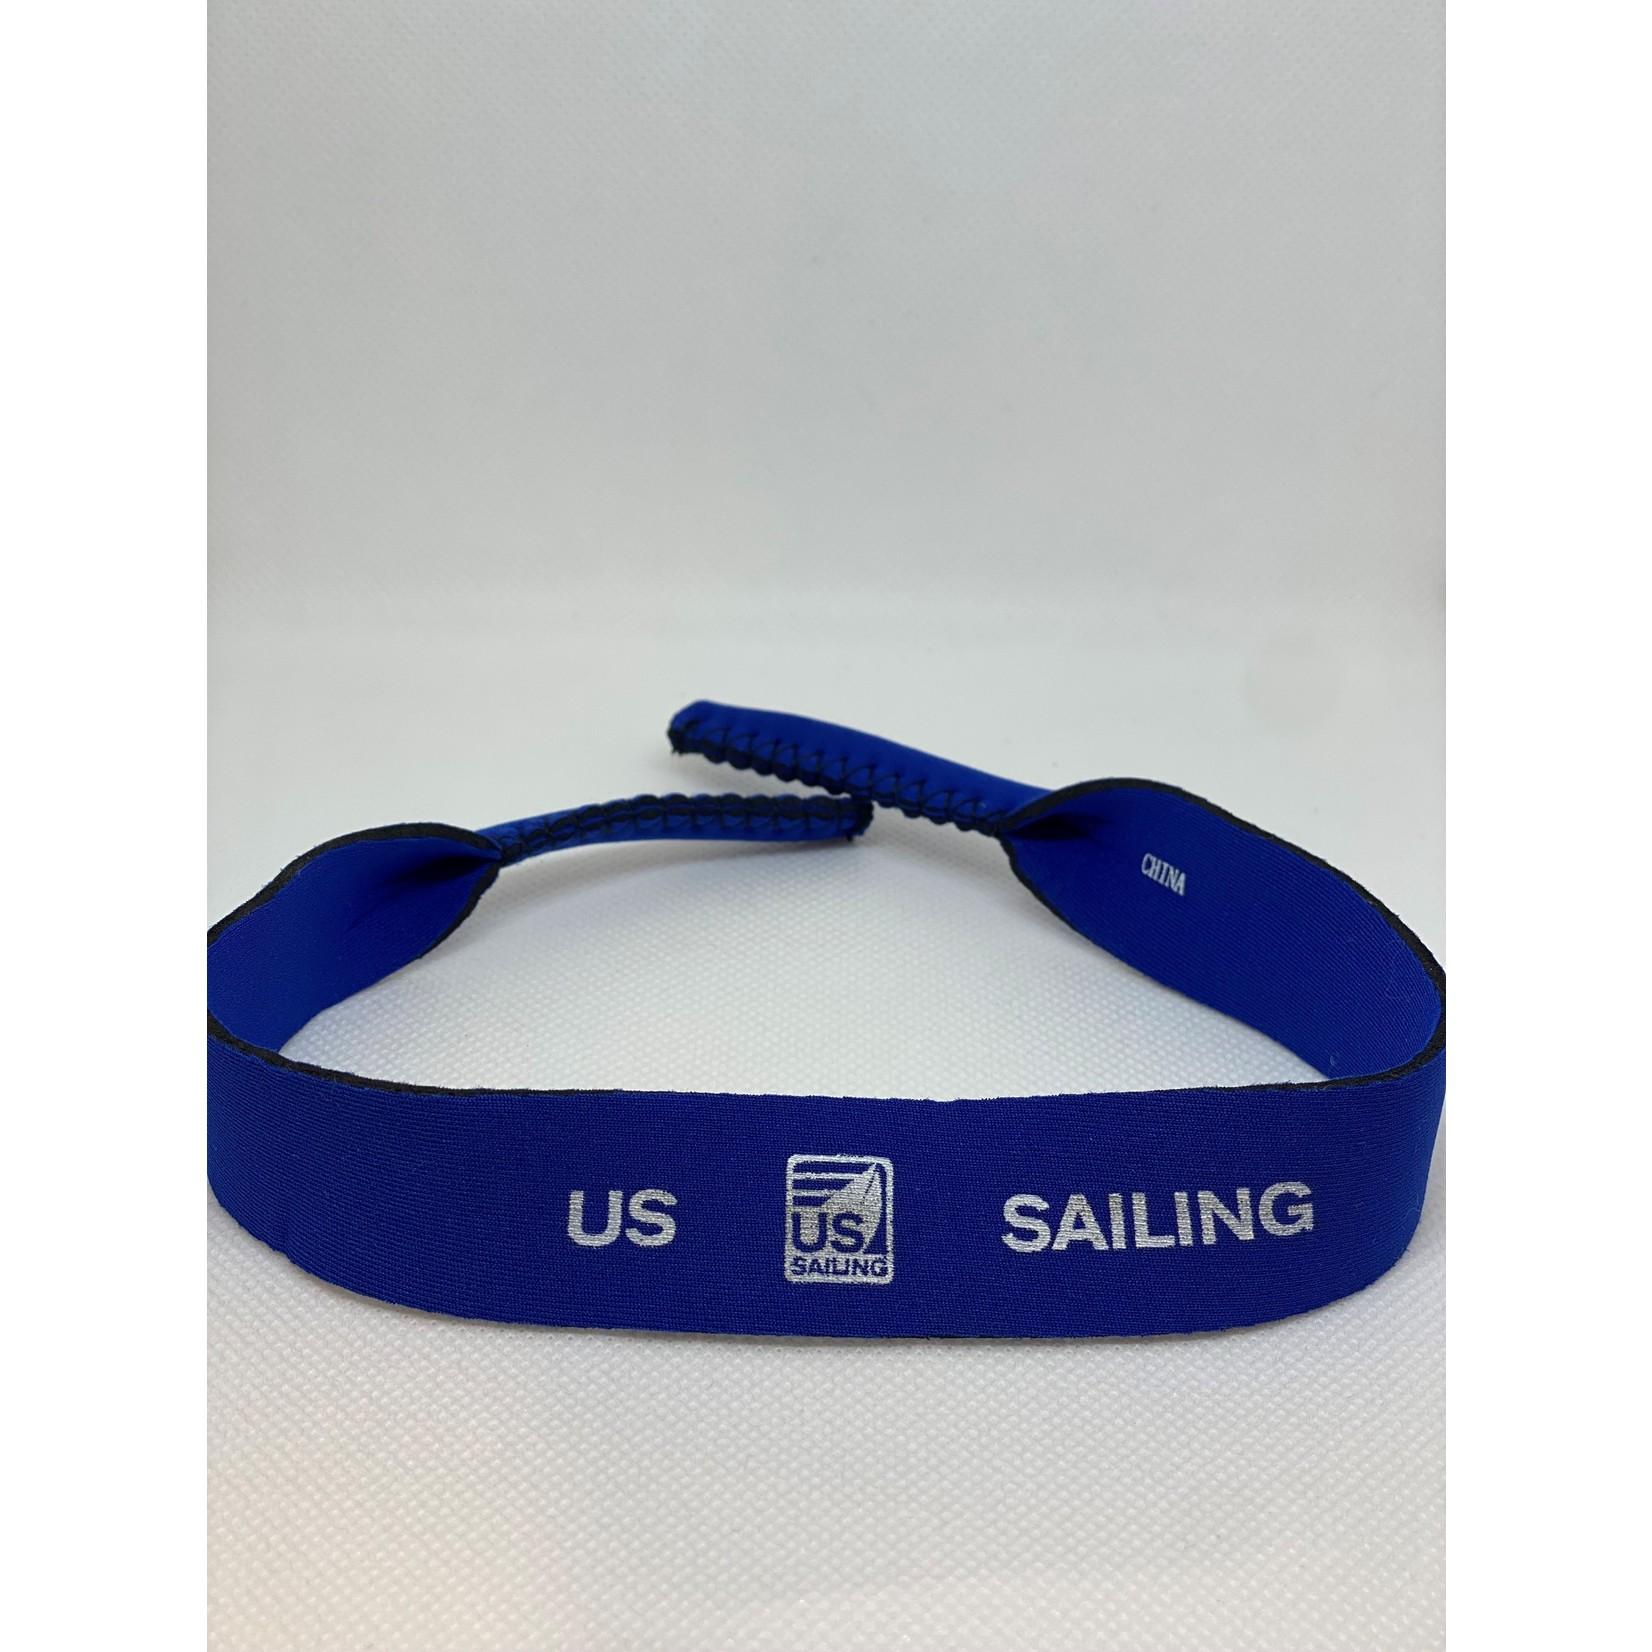 US Sailing Sunglasses Strap